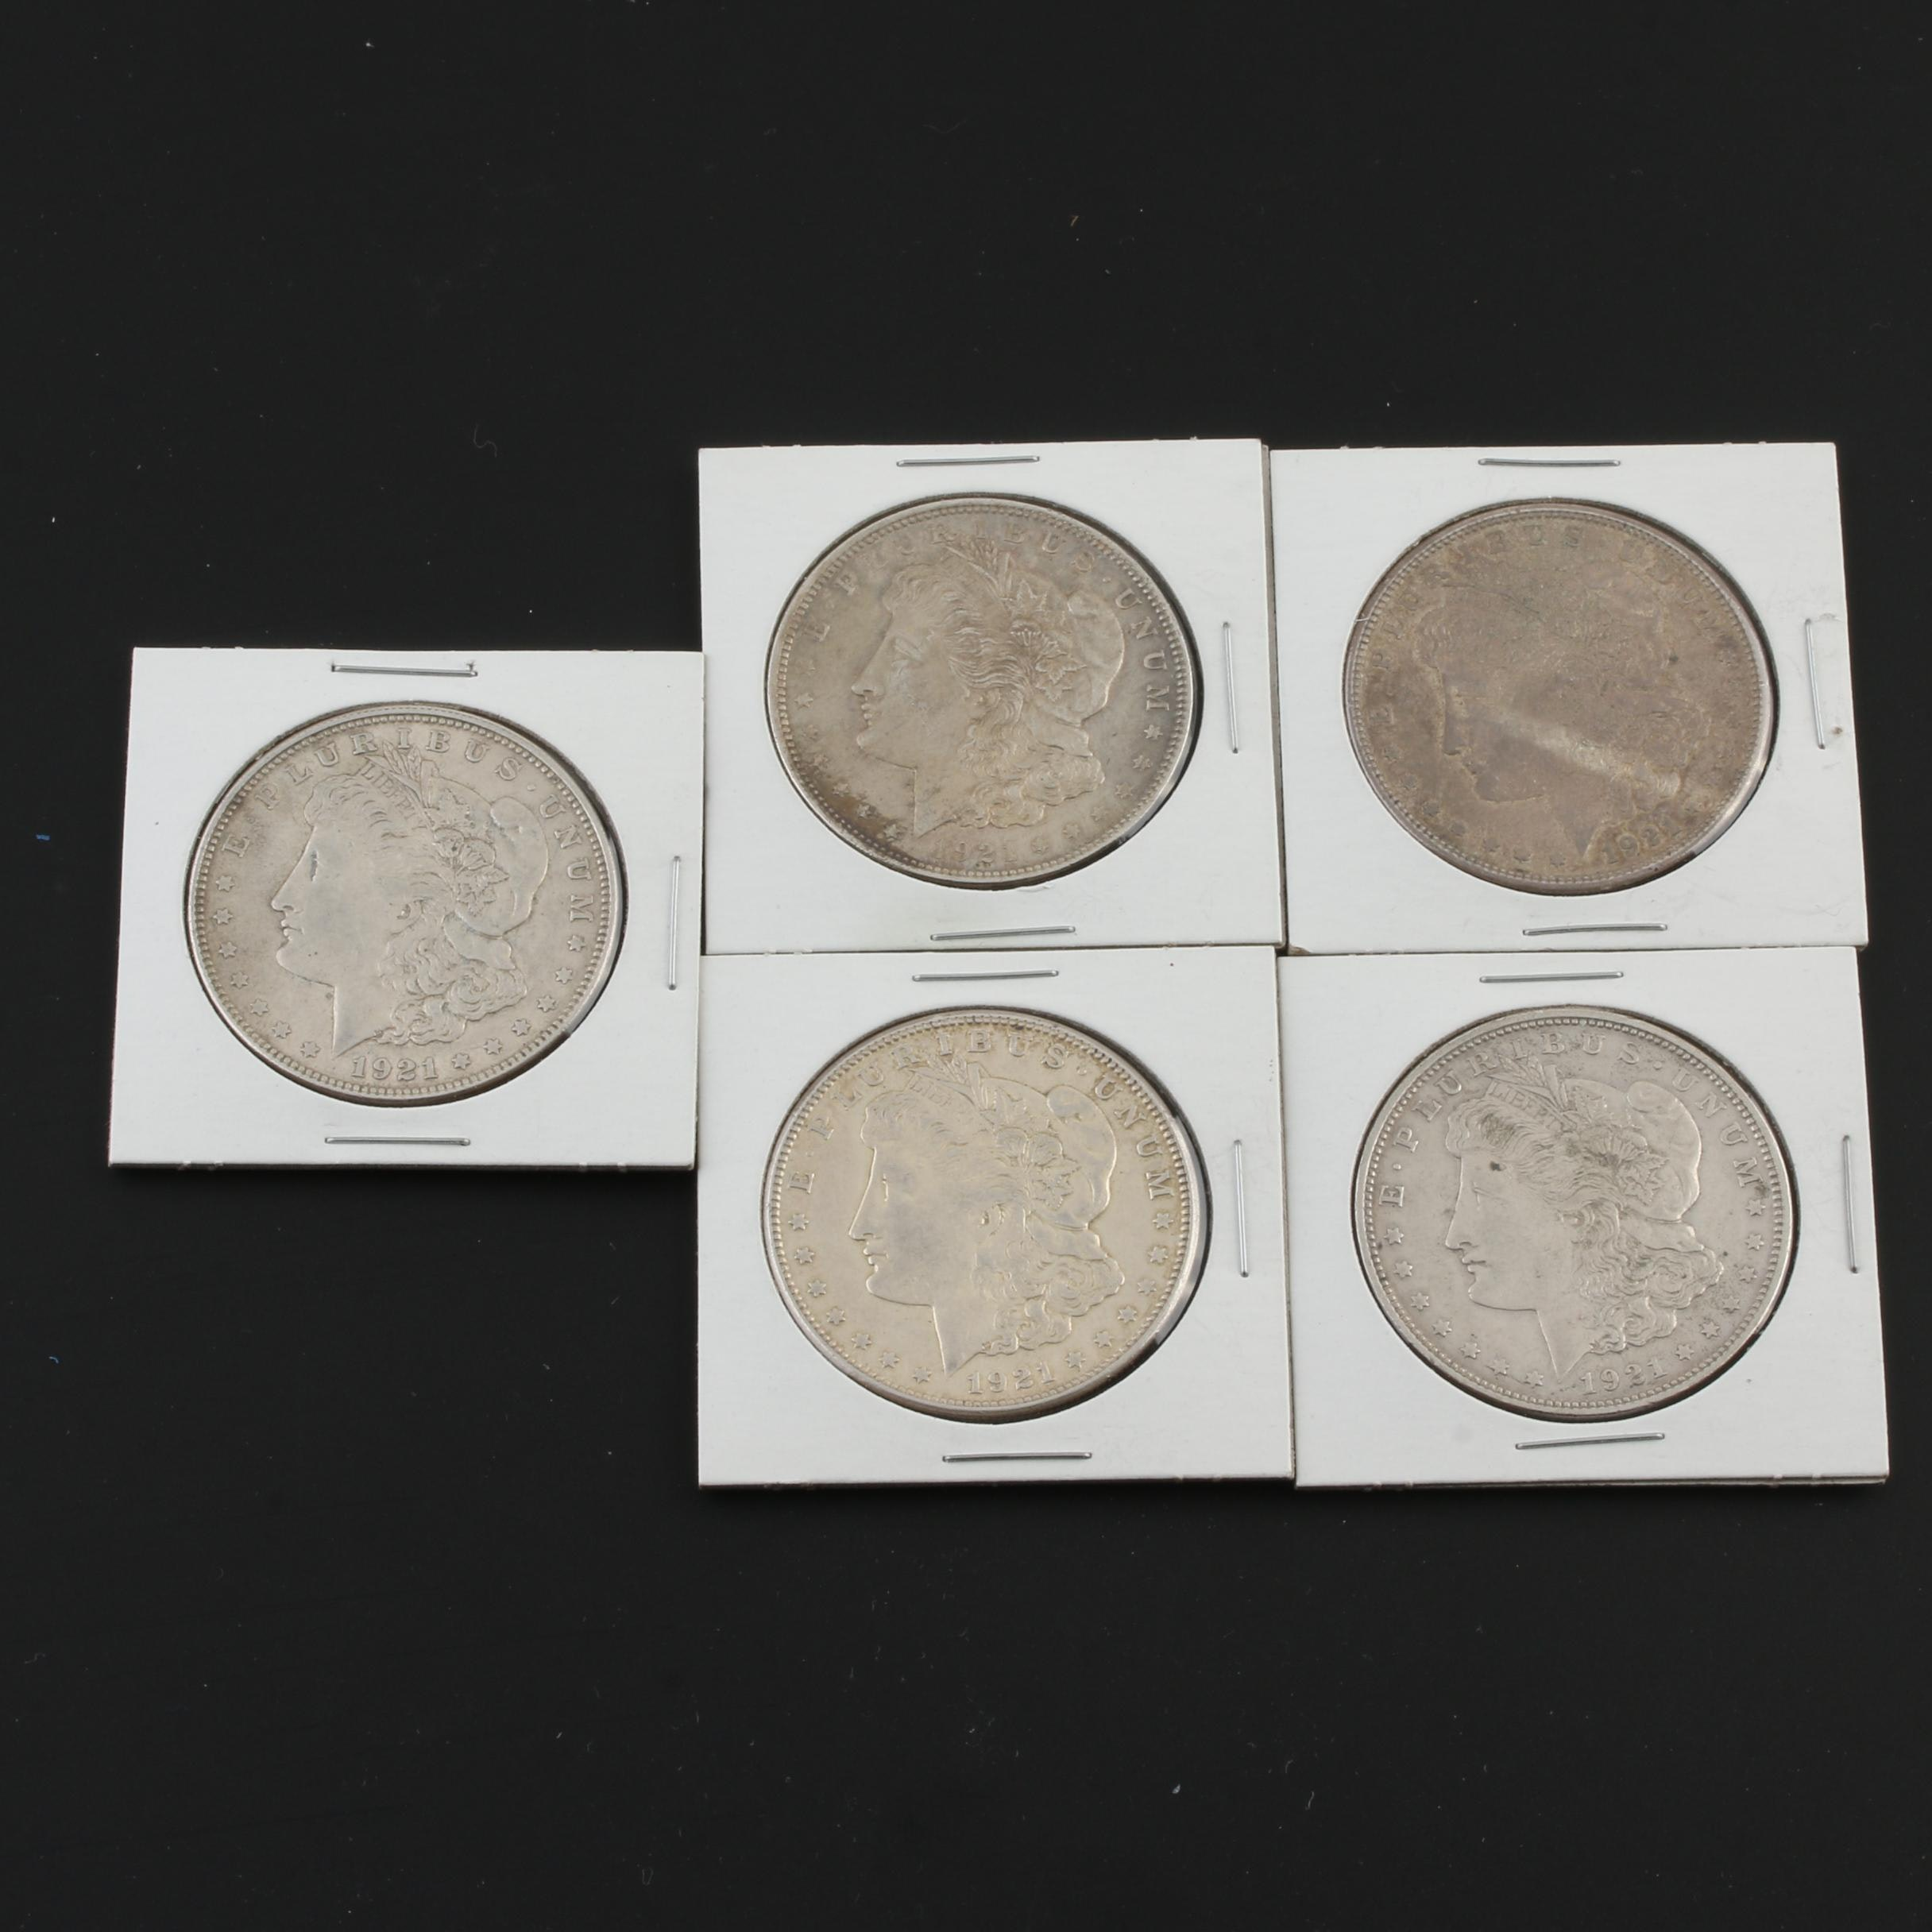 Five Morgan Silver Dollars From 1921